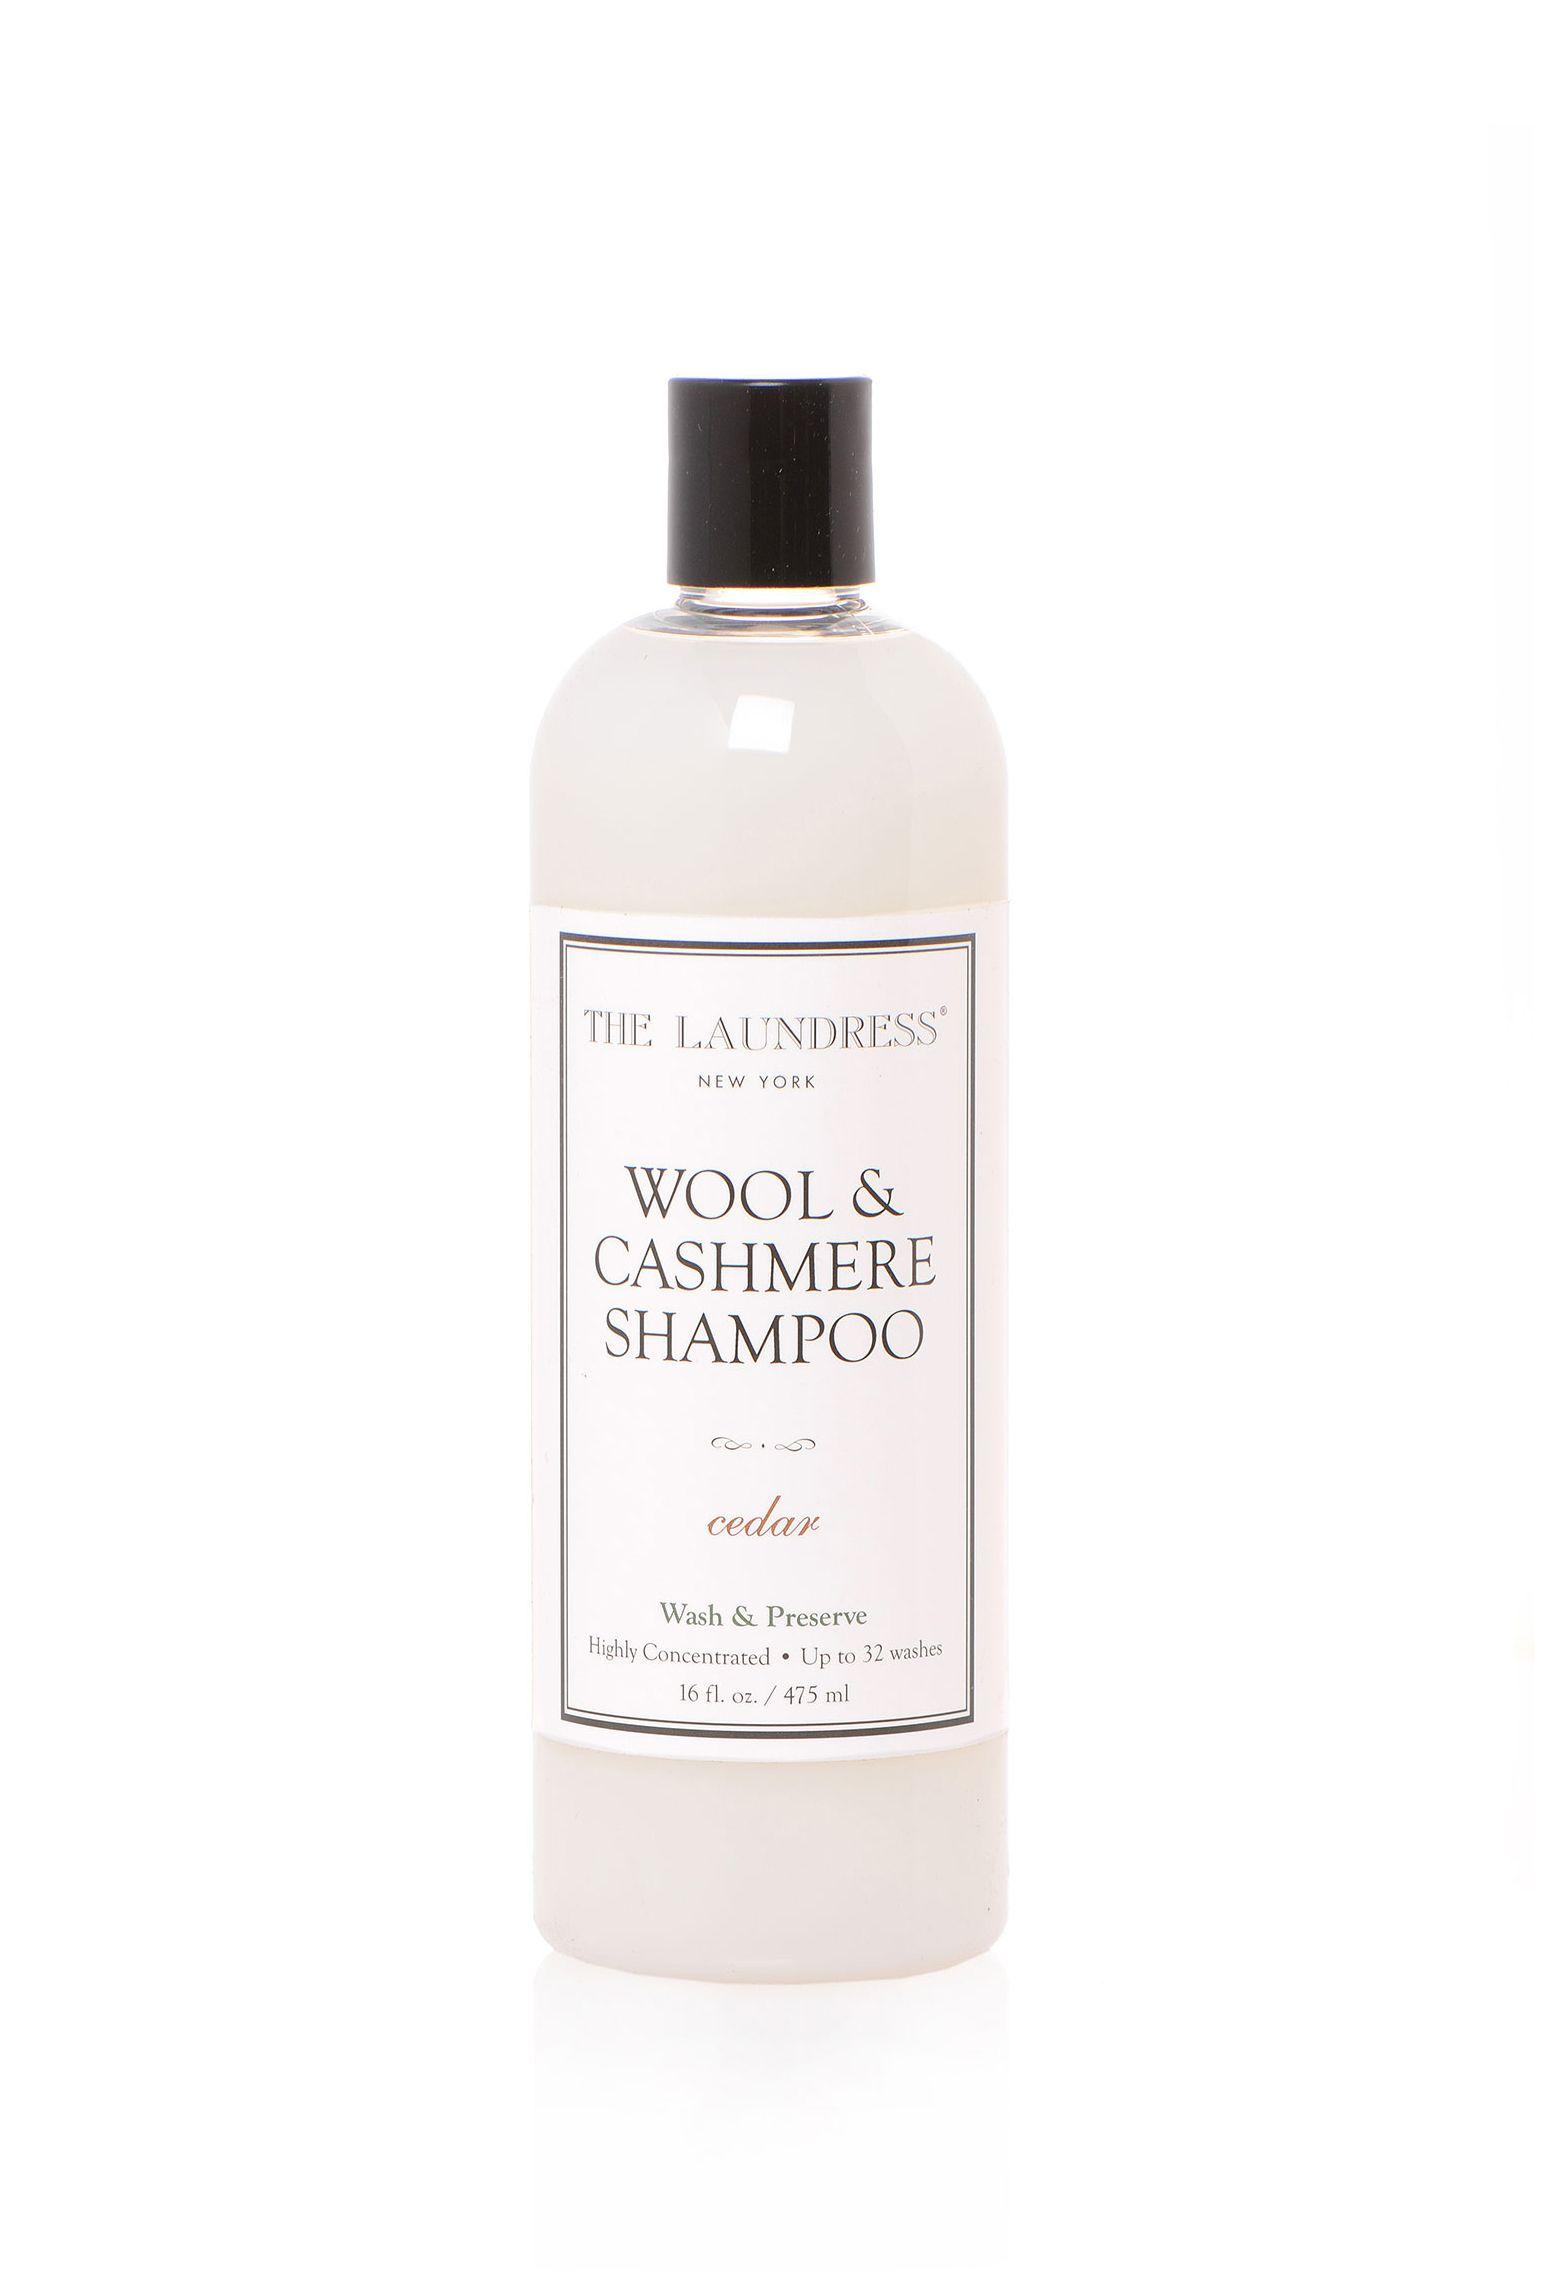 Wool & Cashmere Shampoo 16 fl oz Delicate wash, The